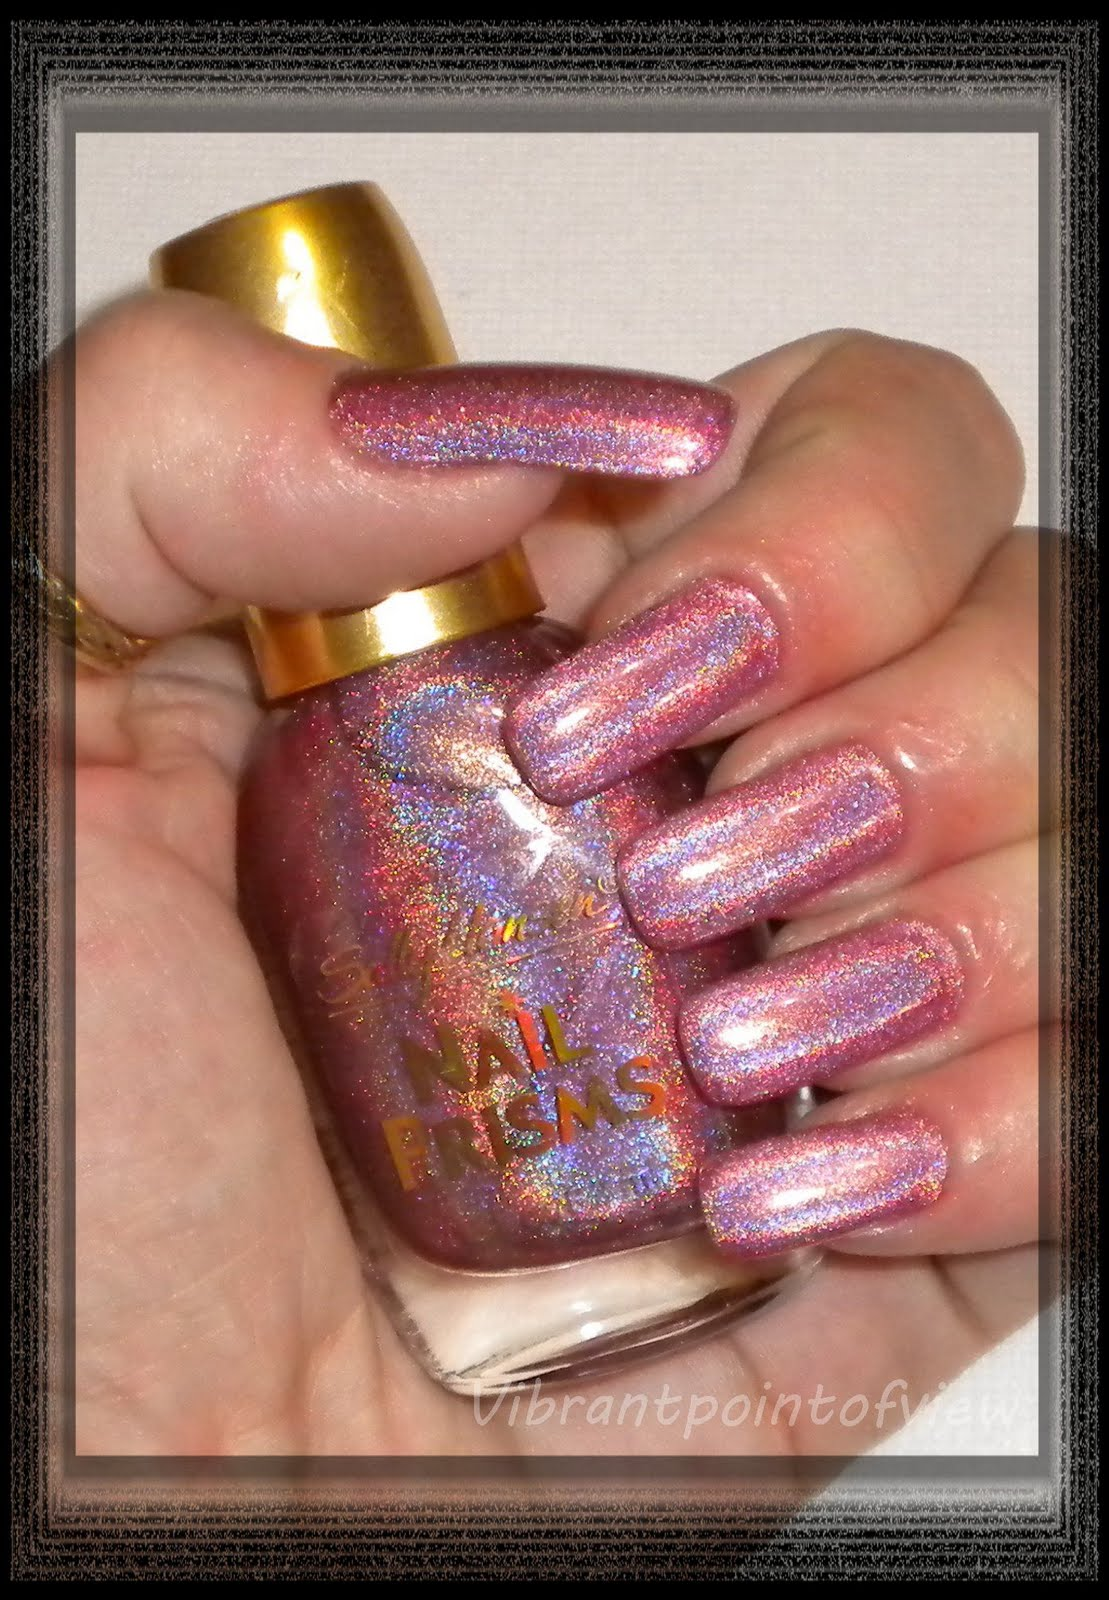 http://2.bp.blogspot.com/_S9X60e_FDVo/TBWSiWSV6wI/AAAAAAAAA5w/YvDBm6N65yQ/s1600/Sally+Hansen+Nail+Prisms+%2302+Pink+Rose+Diamond+Light+Version+-+With+Bottle.jpg